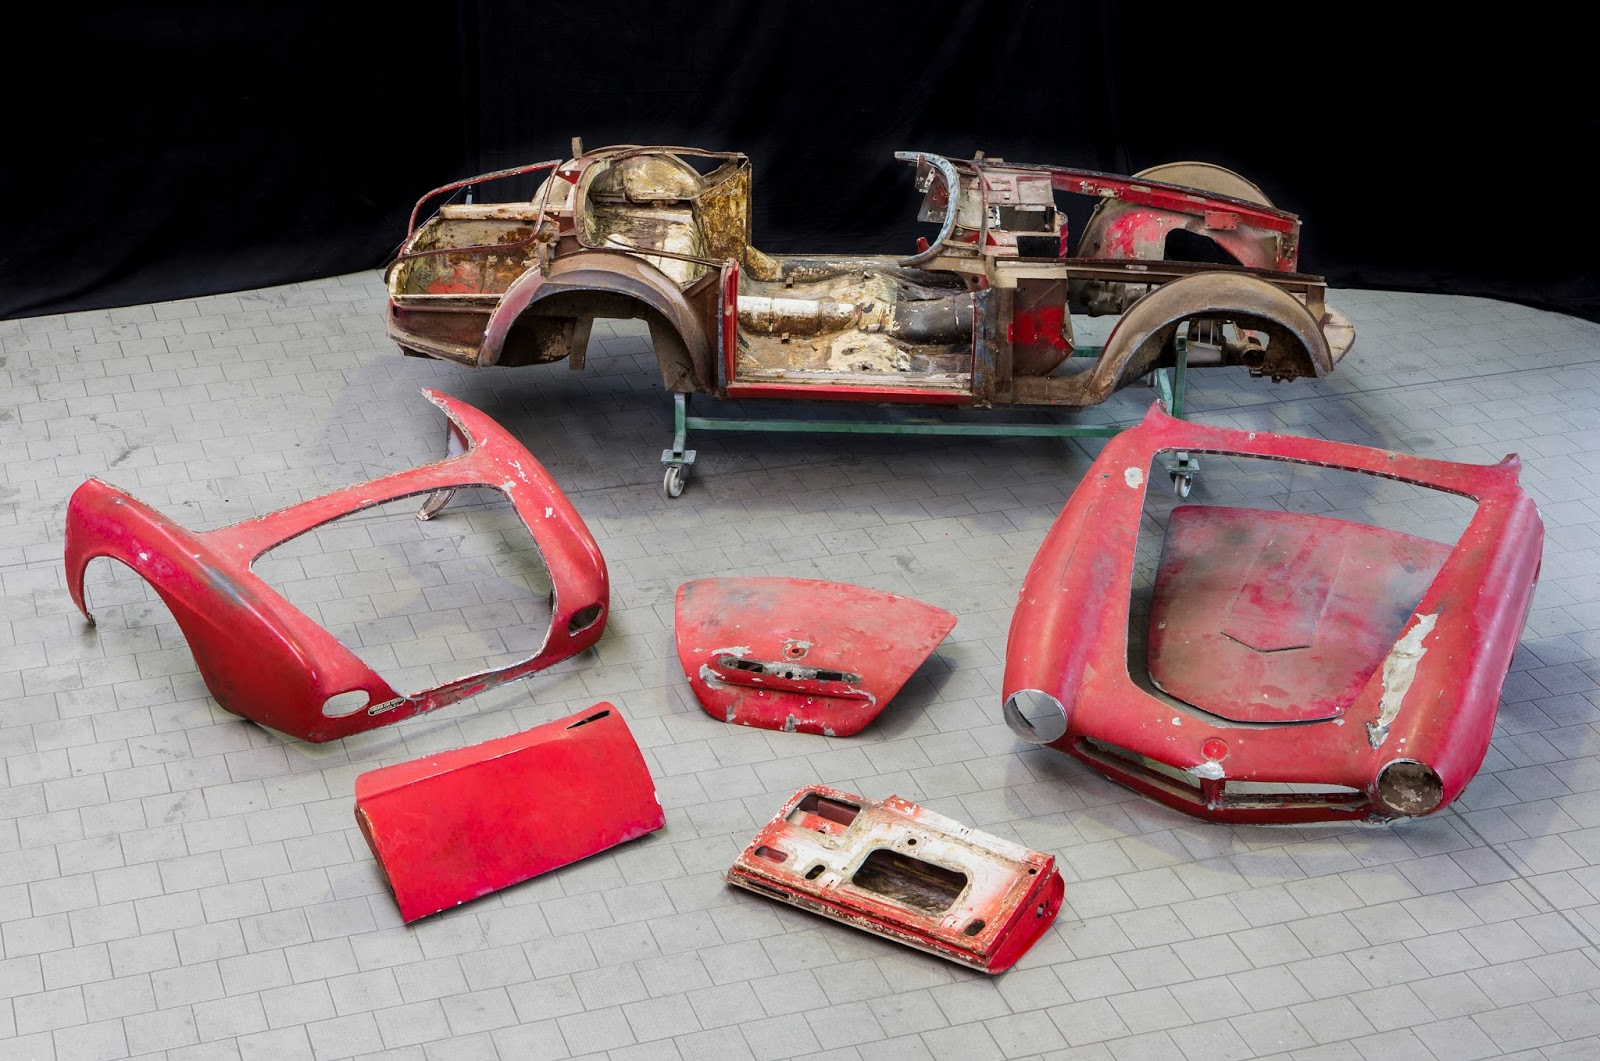 P90229711 highRes restoration of elvis 1 Η επιστροφή της μυθικής BMW 507 του Elvis στο Concours d'Elegance, Pebble Beach autoshow, BMW, BMW 507, Classic, Concours d'Elegance, Roadster, zblog